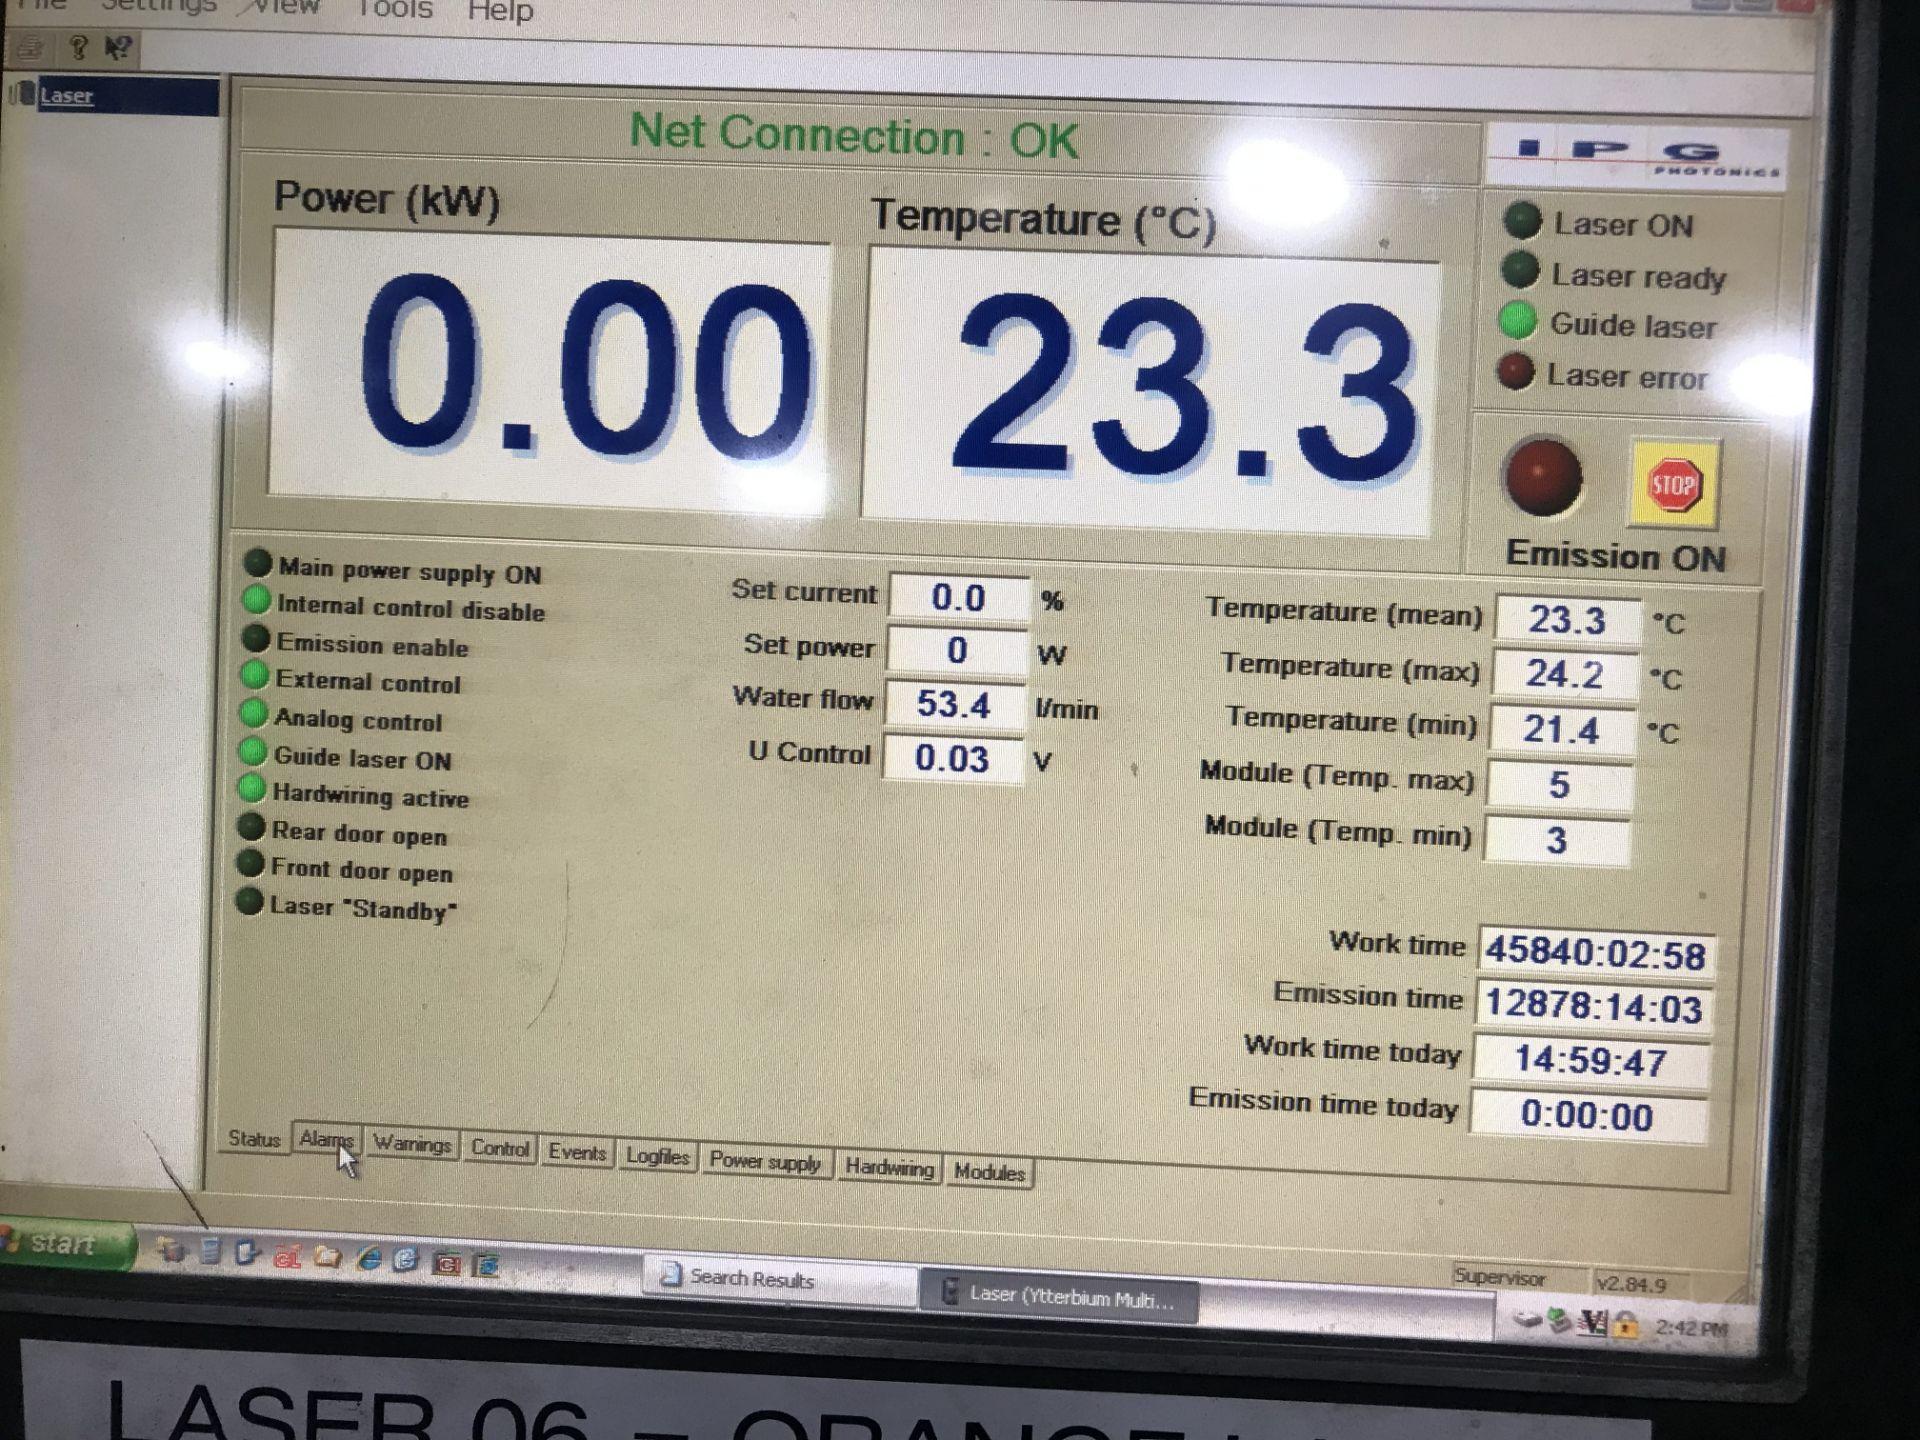 Lot 3 - Cincinnati CL940 Fiber Laser, 4,000 Watt, 5' x 10' Dual Pallets, Chiller, Dust Collector, Low Hours